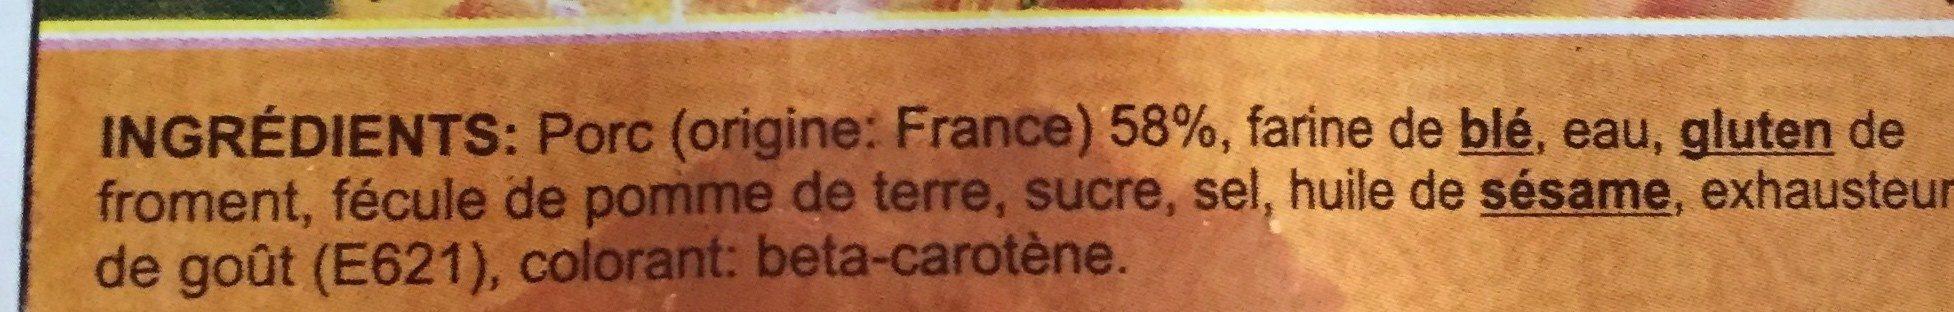 XIU MAI Bouchons au porc - Ingredients - fr